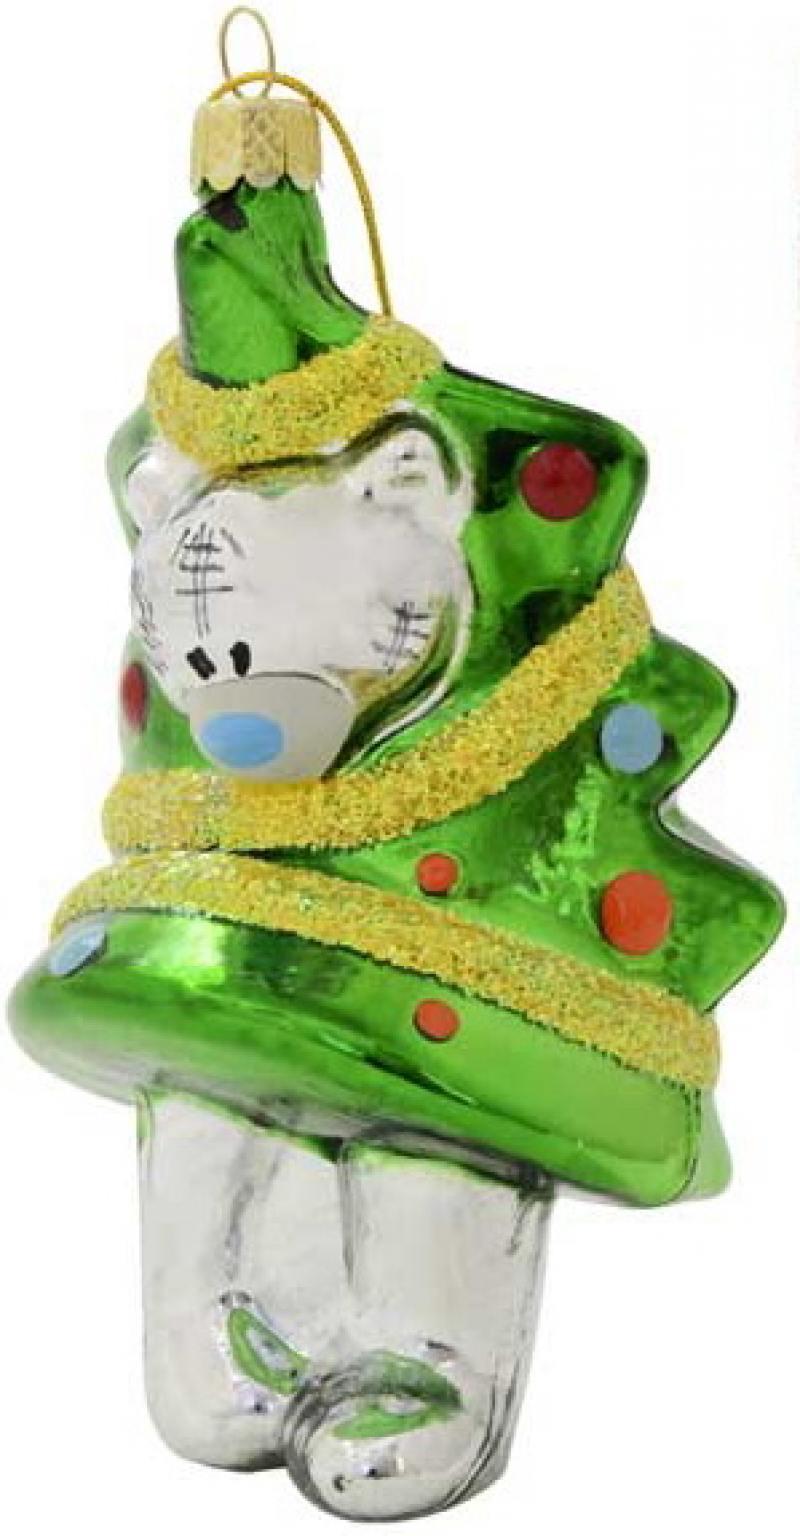 Игрушка елочная Me to you Мишка Тедди, стекло, 11см, в подар.кор. футболка для беременных printio мишка me to you